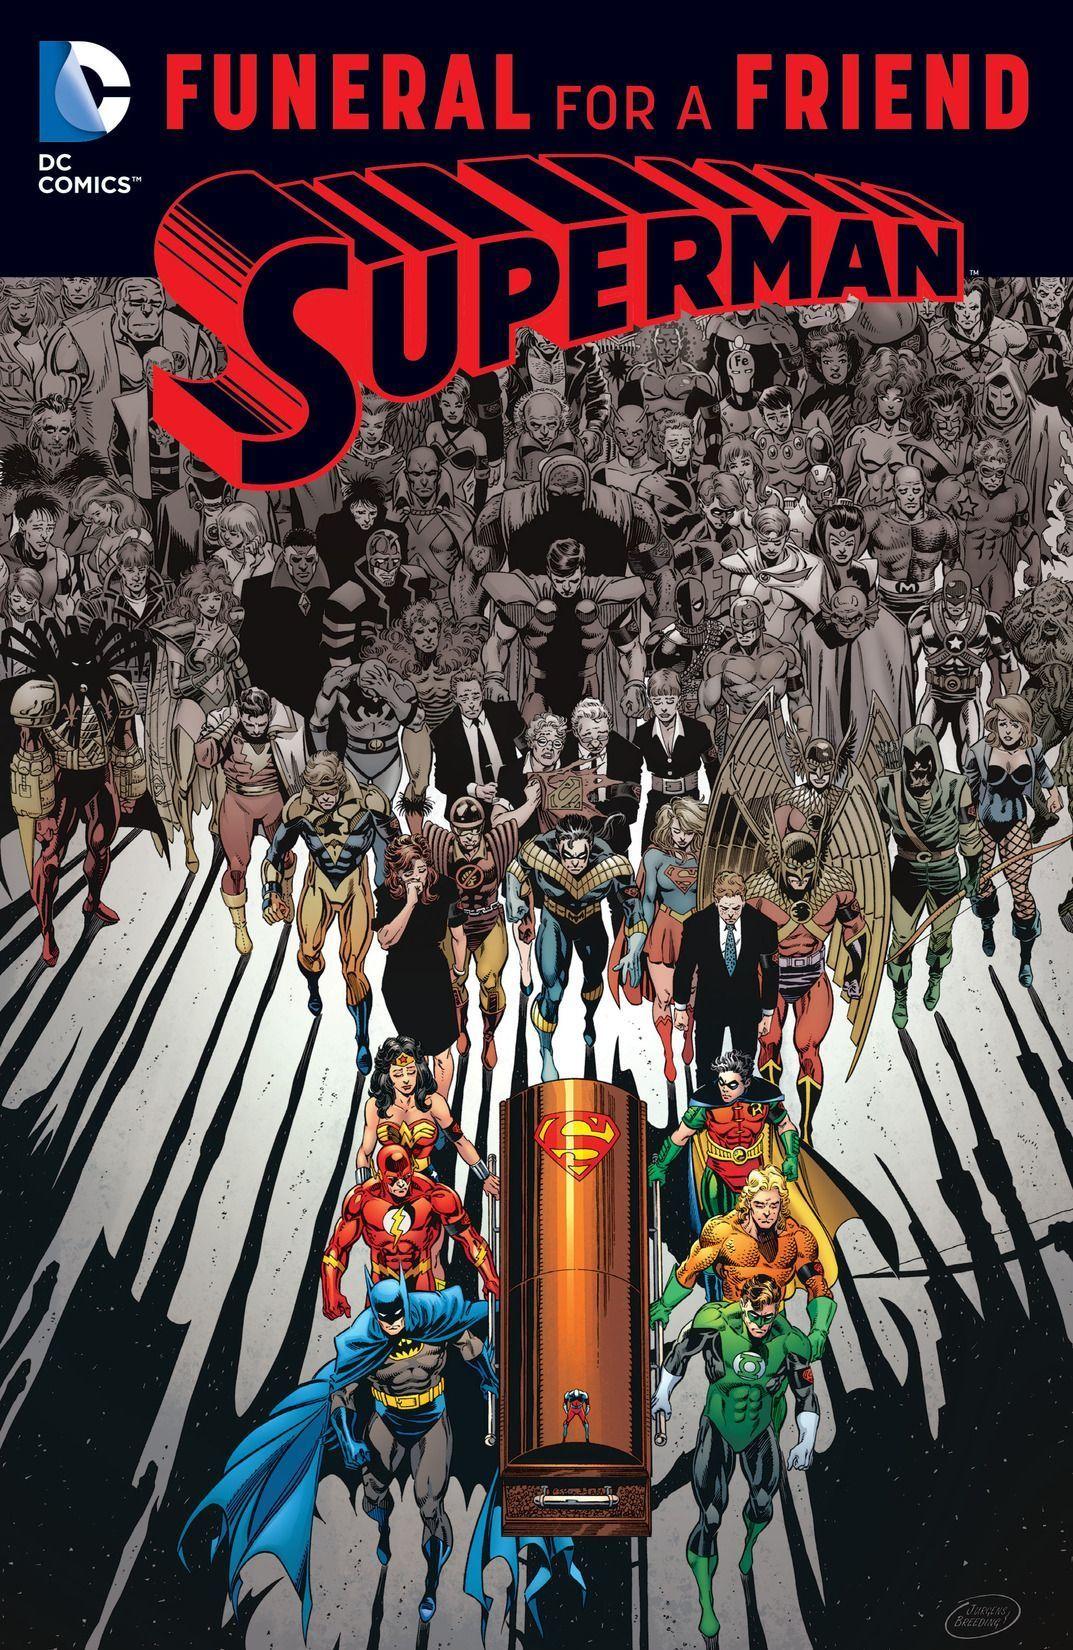 Funeral Friend Superman